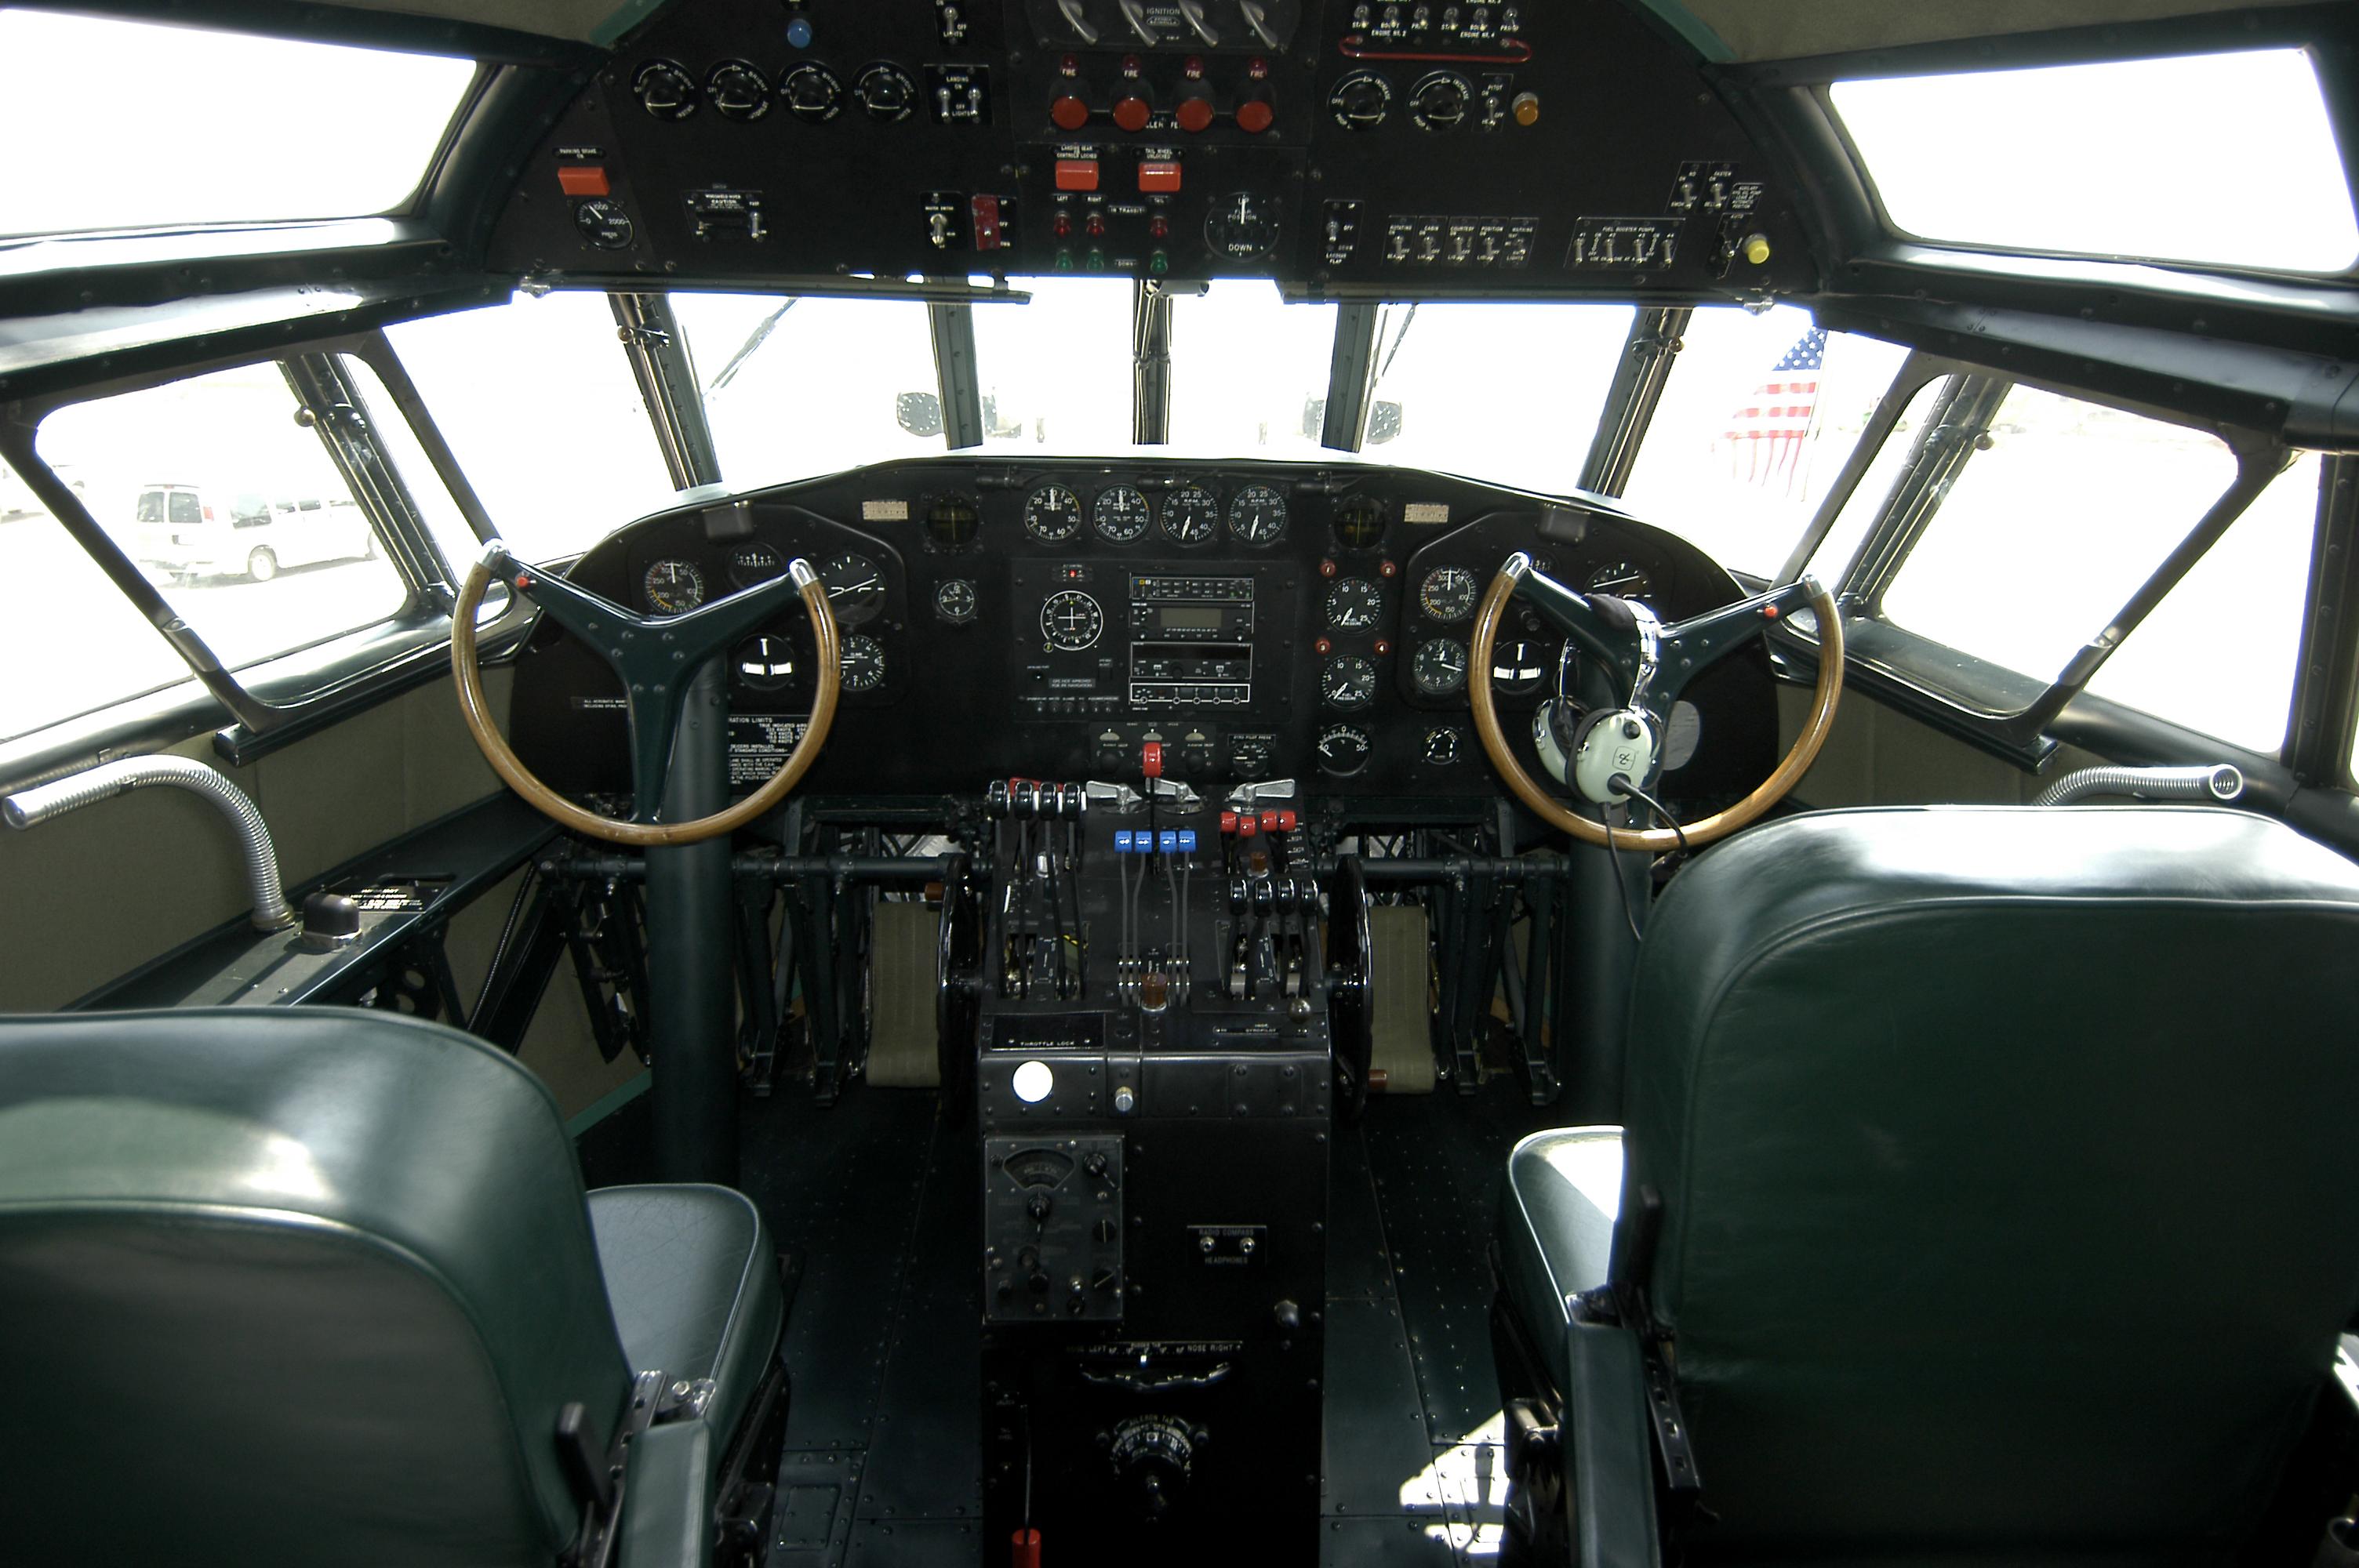 Boeing S-307 Stratoliner Cockpit